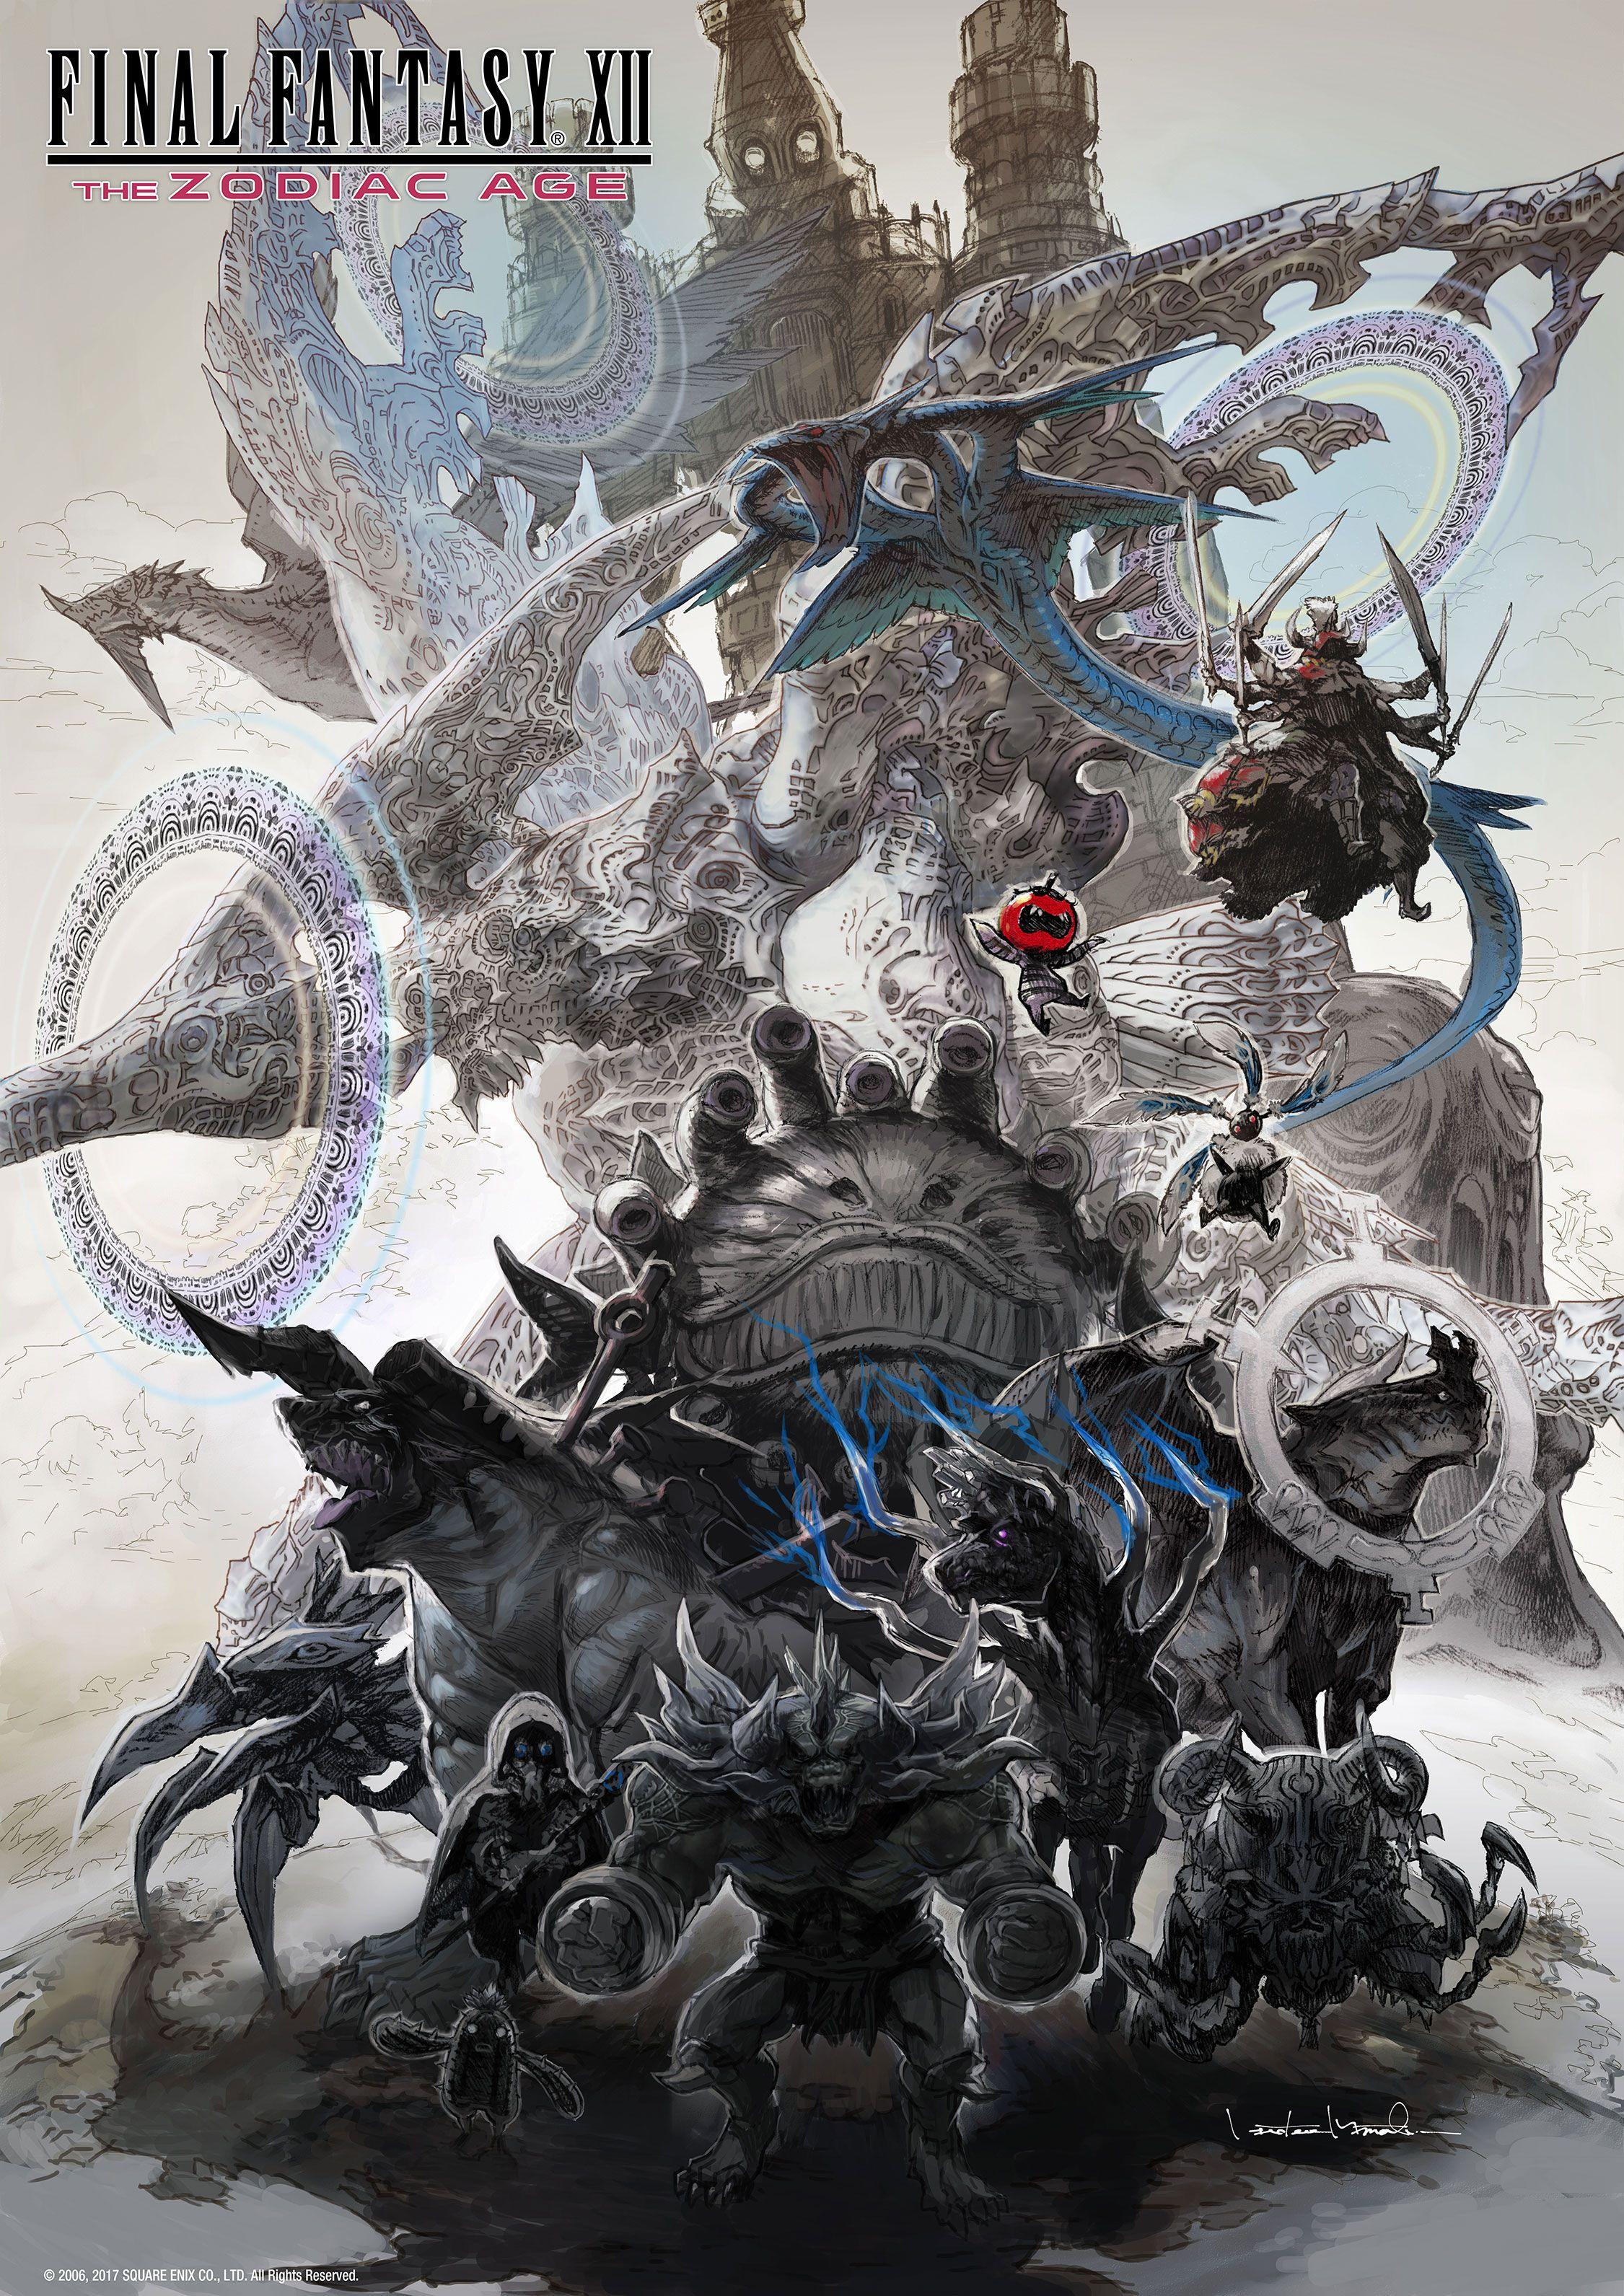 Pin by Deneta on Final Fantasy.